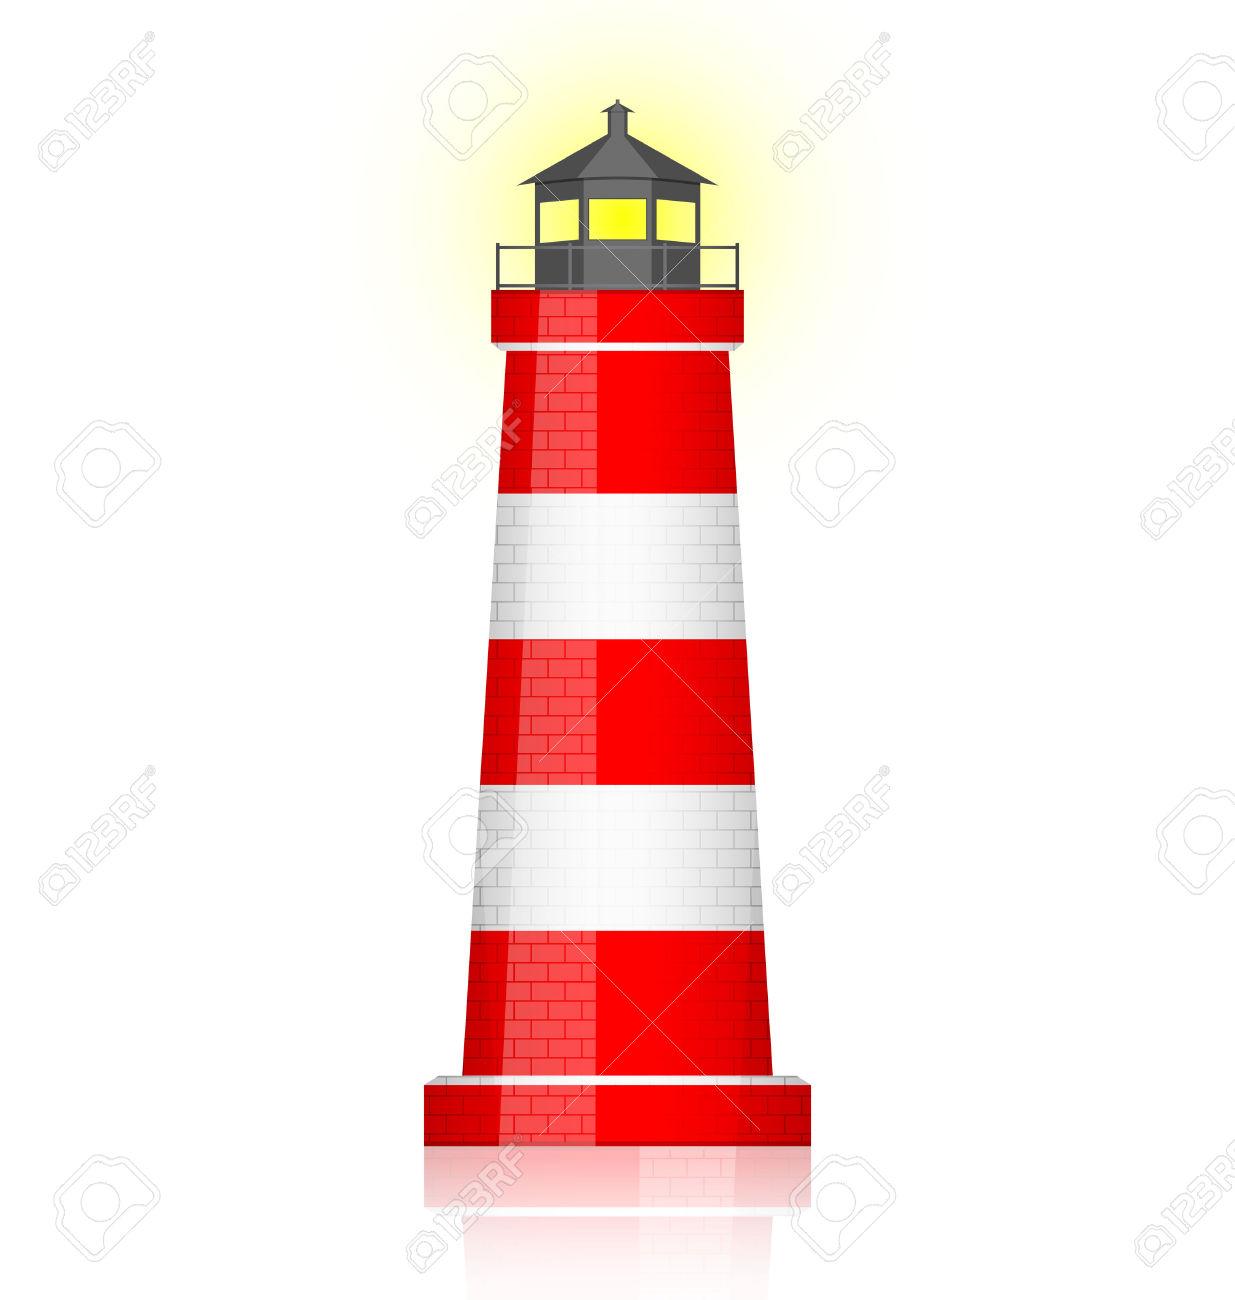 lighthouse: Vector illustration of light-lighthouse: Vector illustration of lighthouse-16